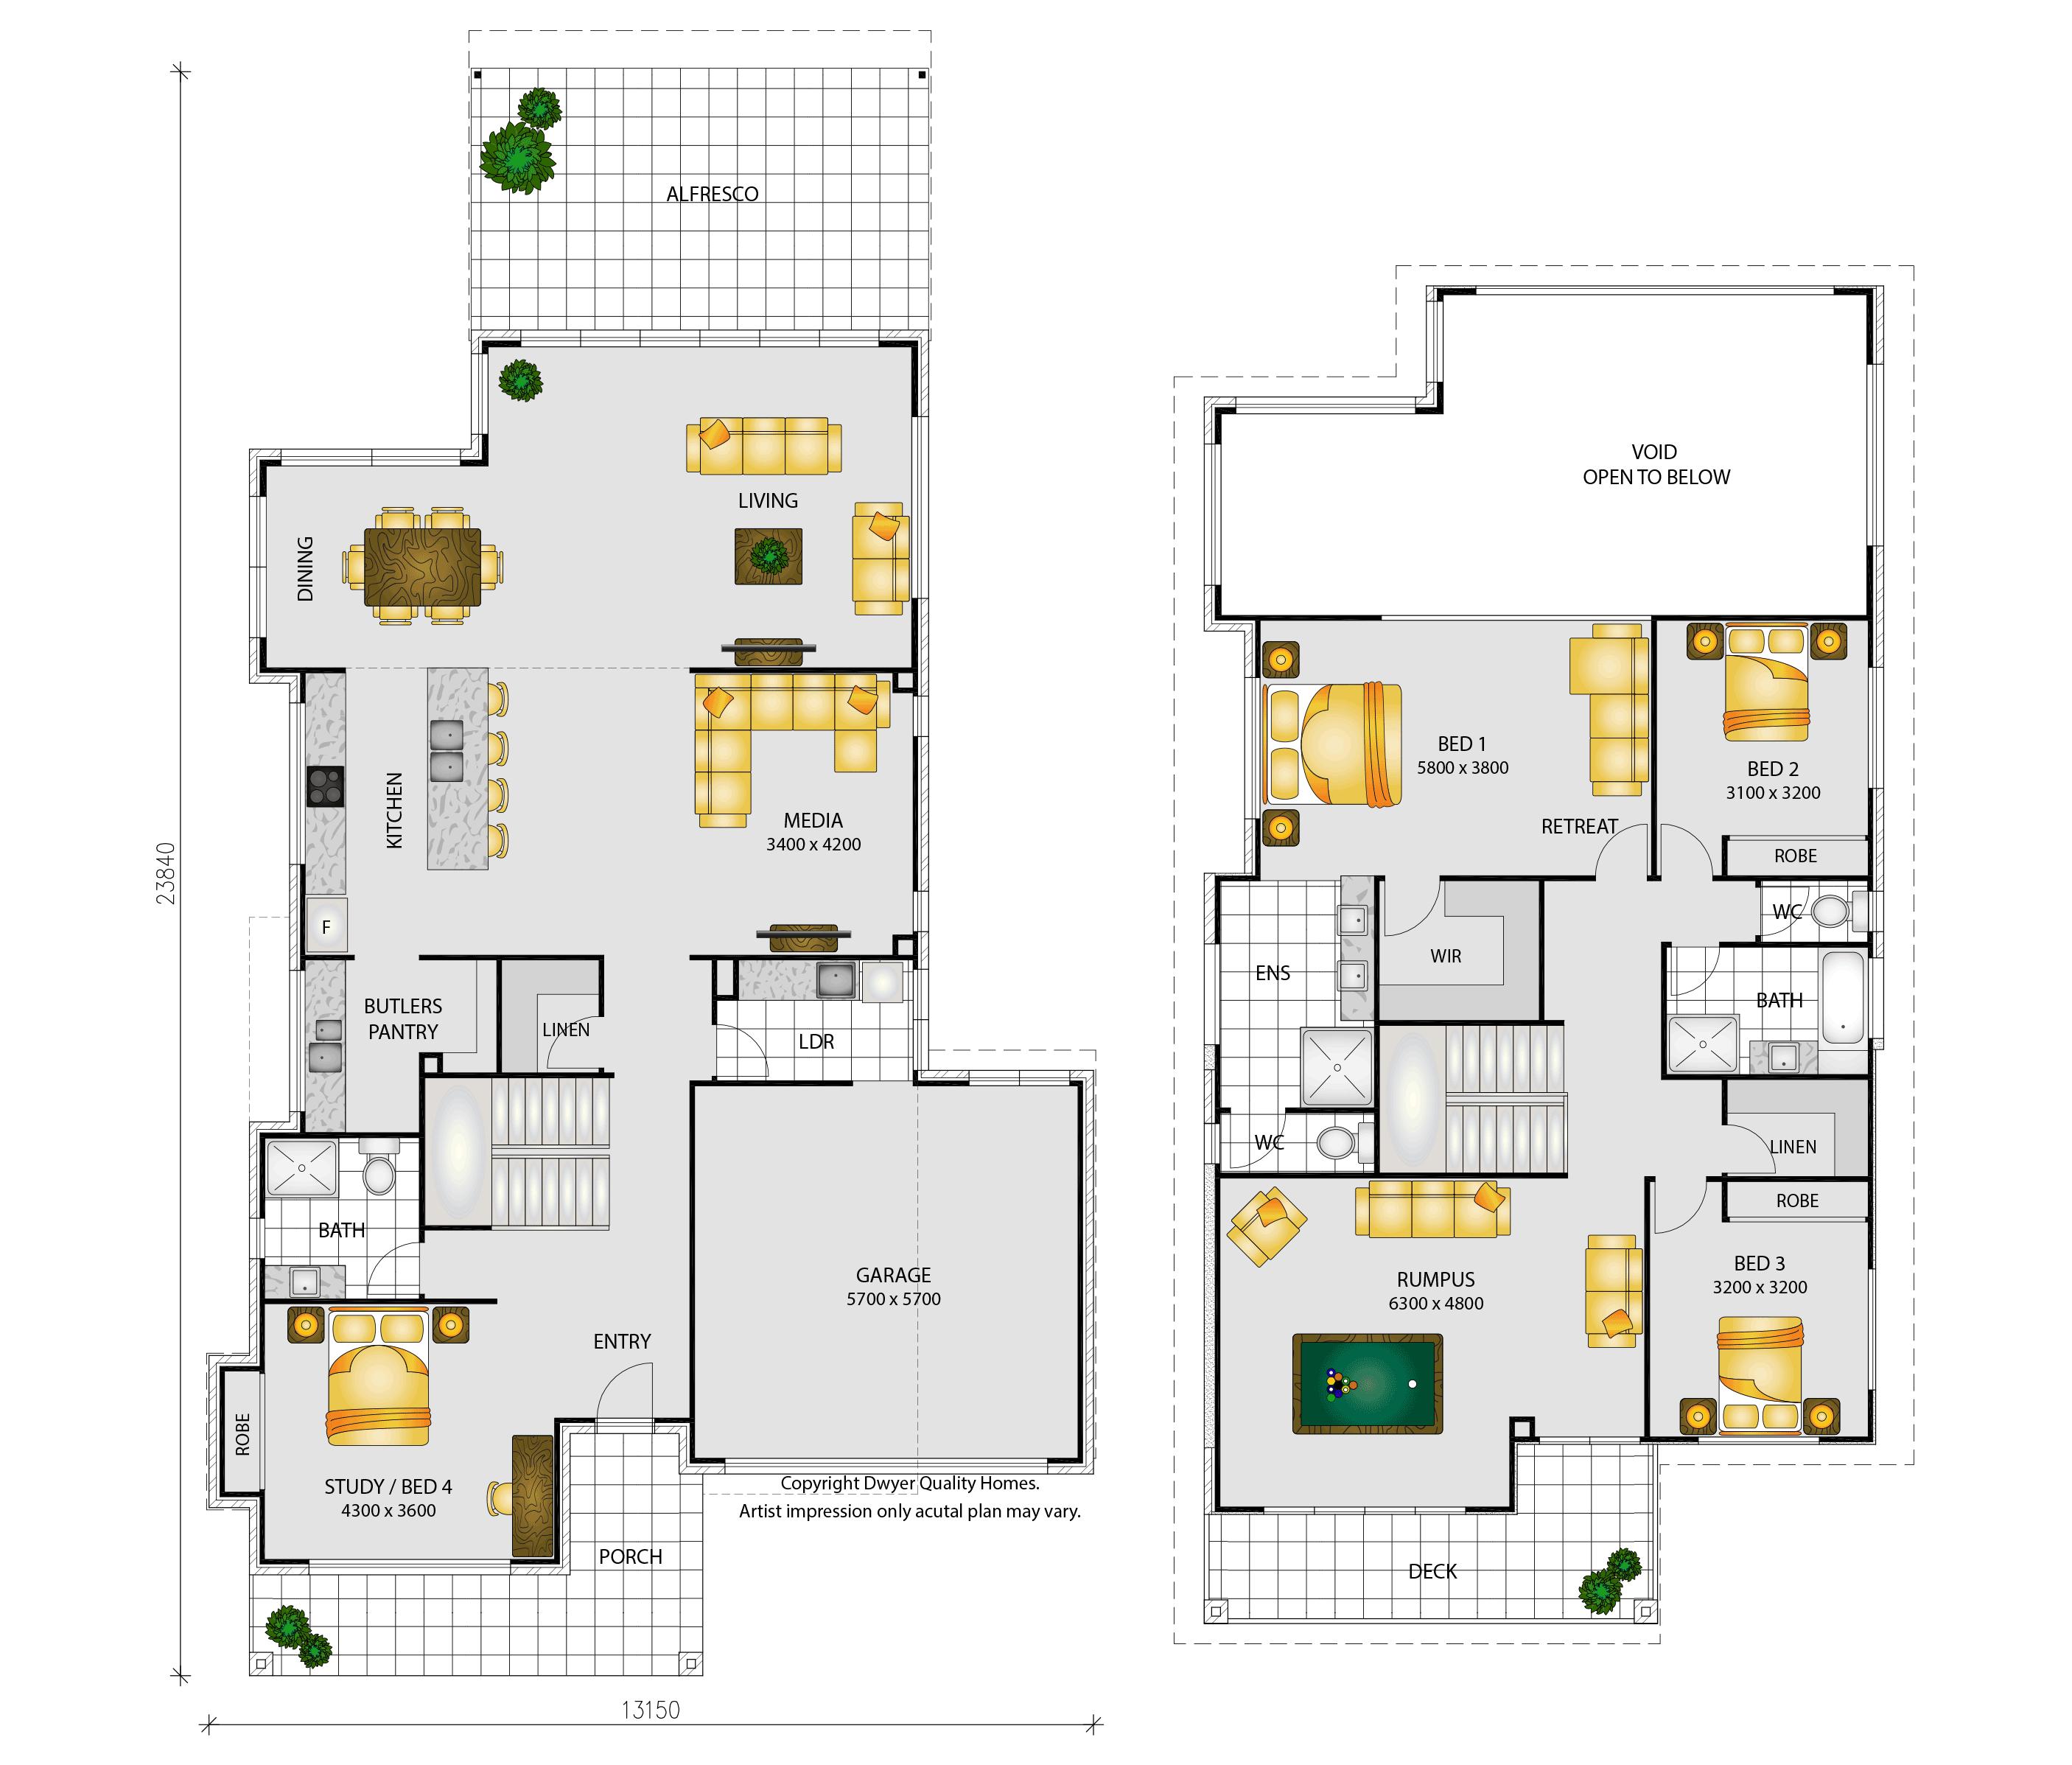 Lumbarda Floorplans